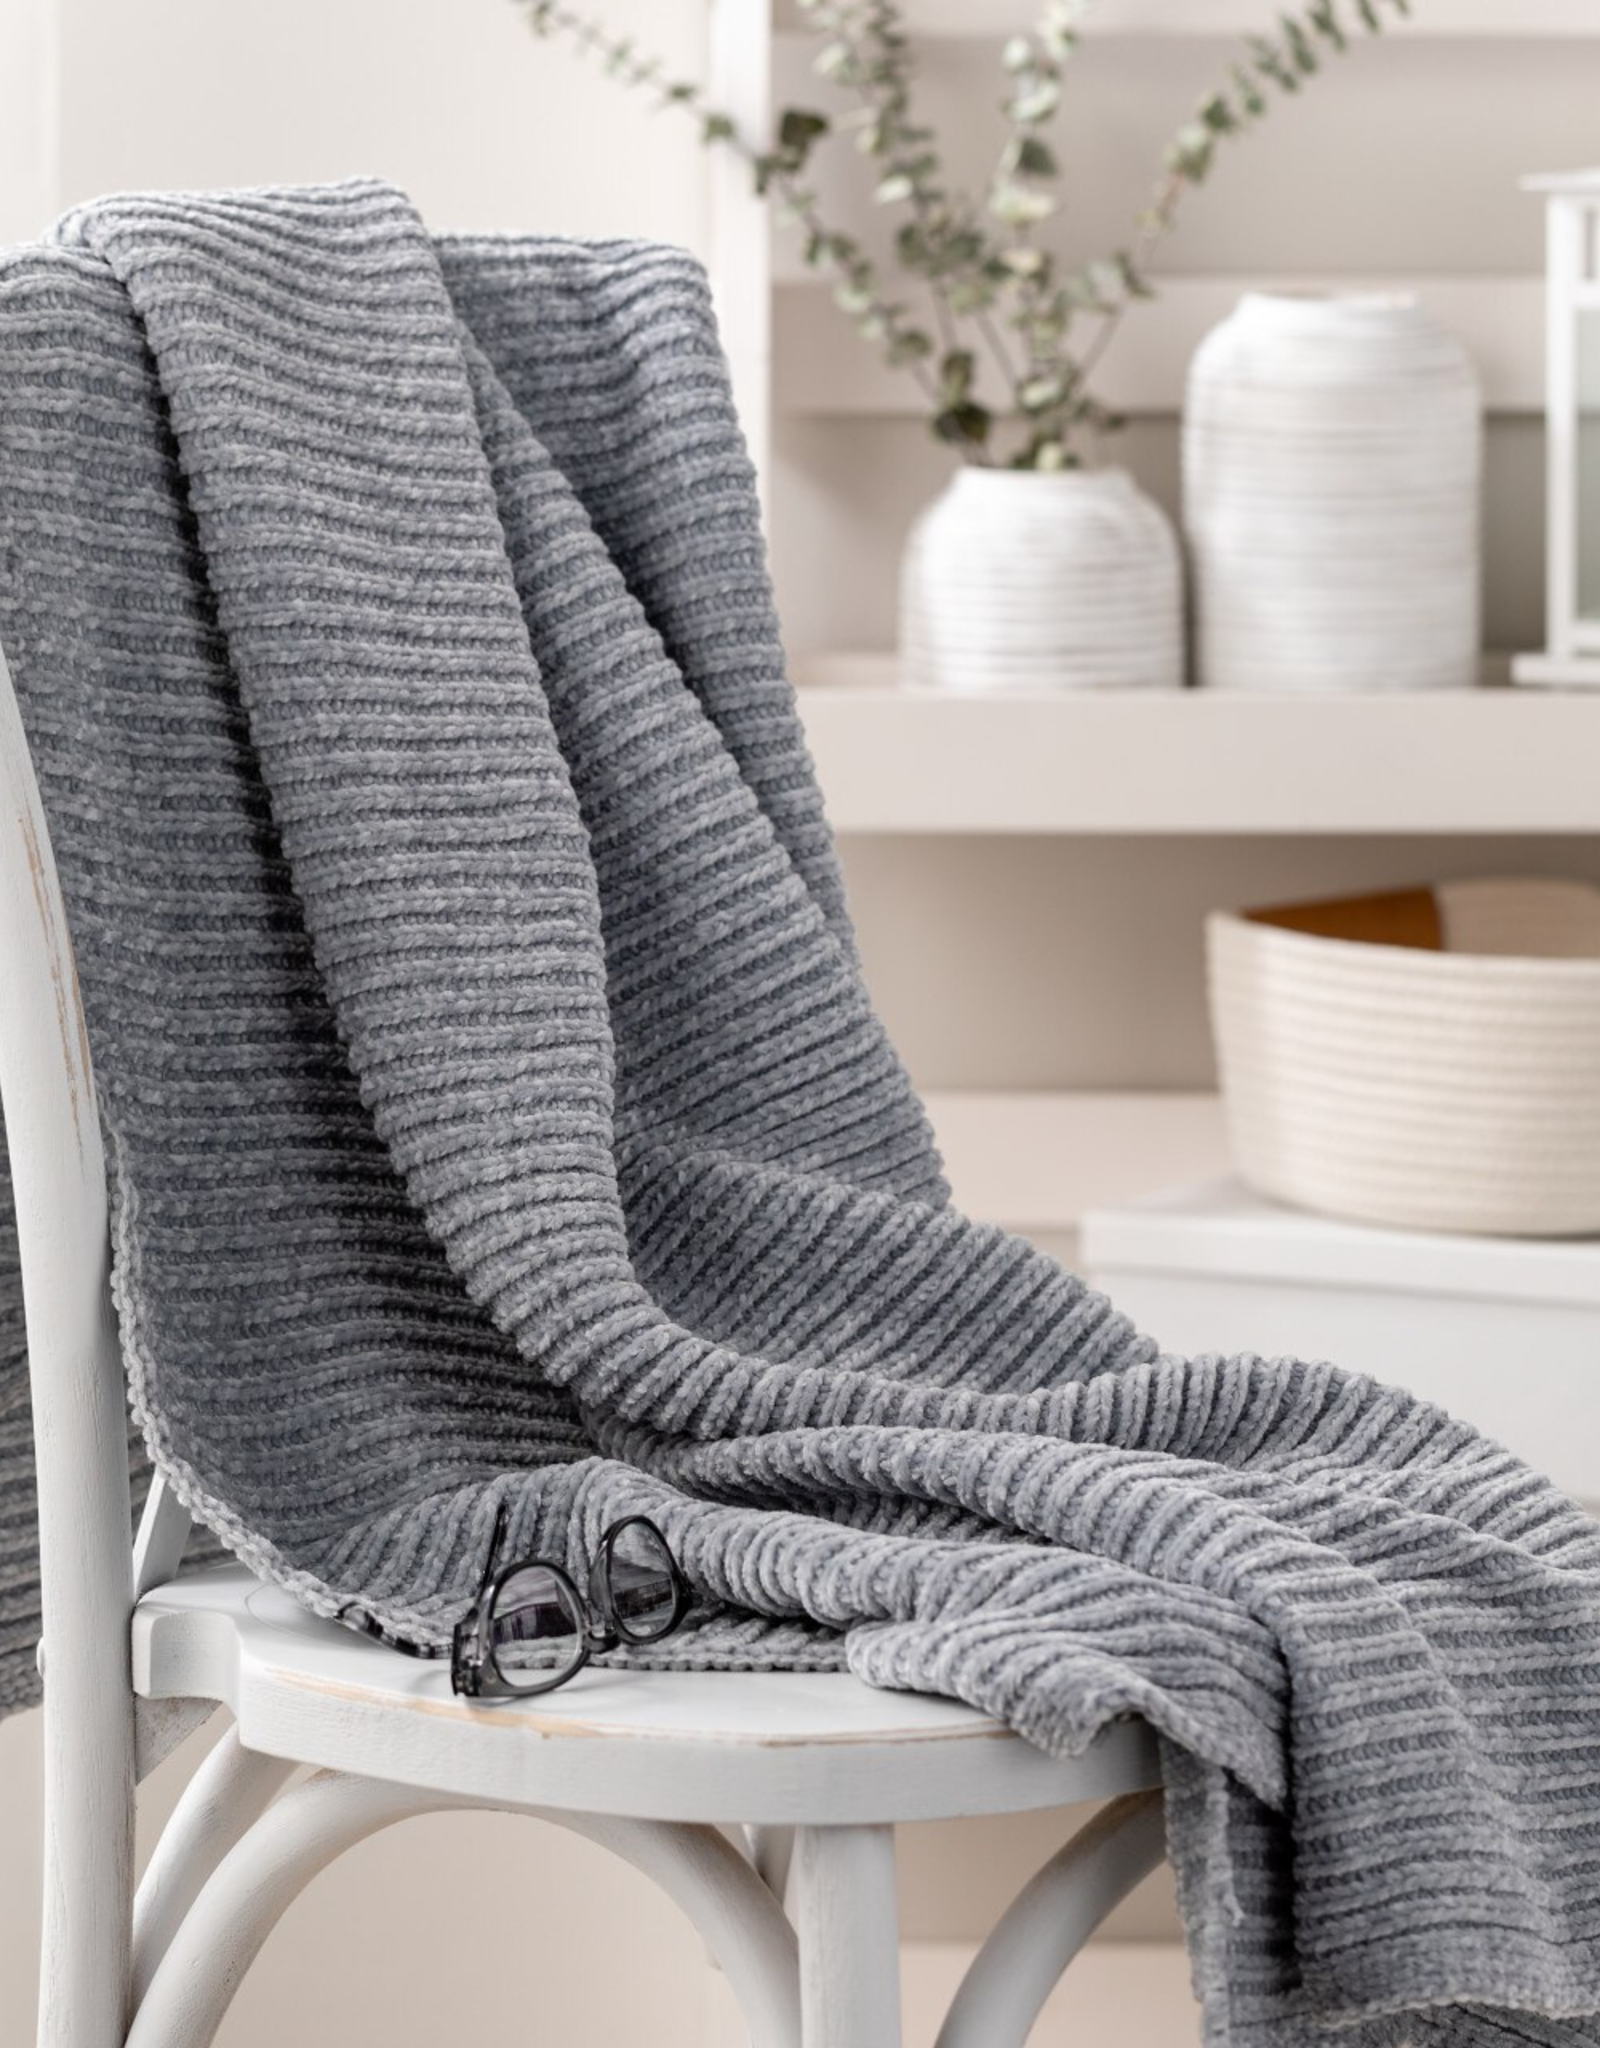 Chenille Throw Blanket - Gray